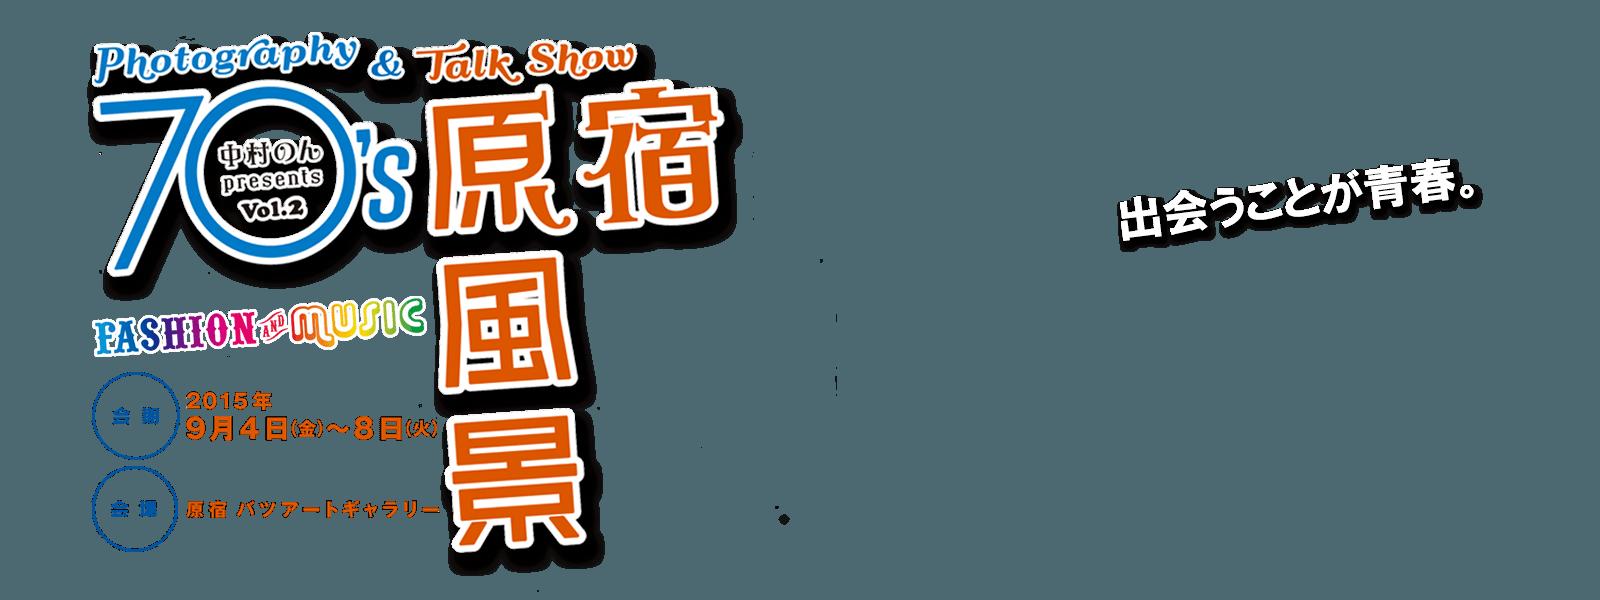 70's原風景 原宿 vol.2